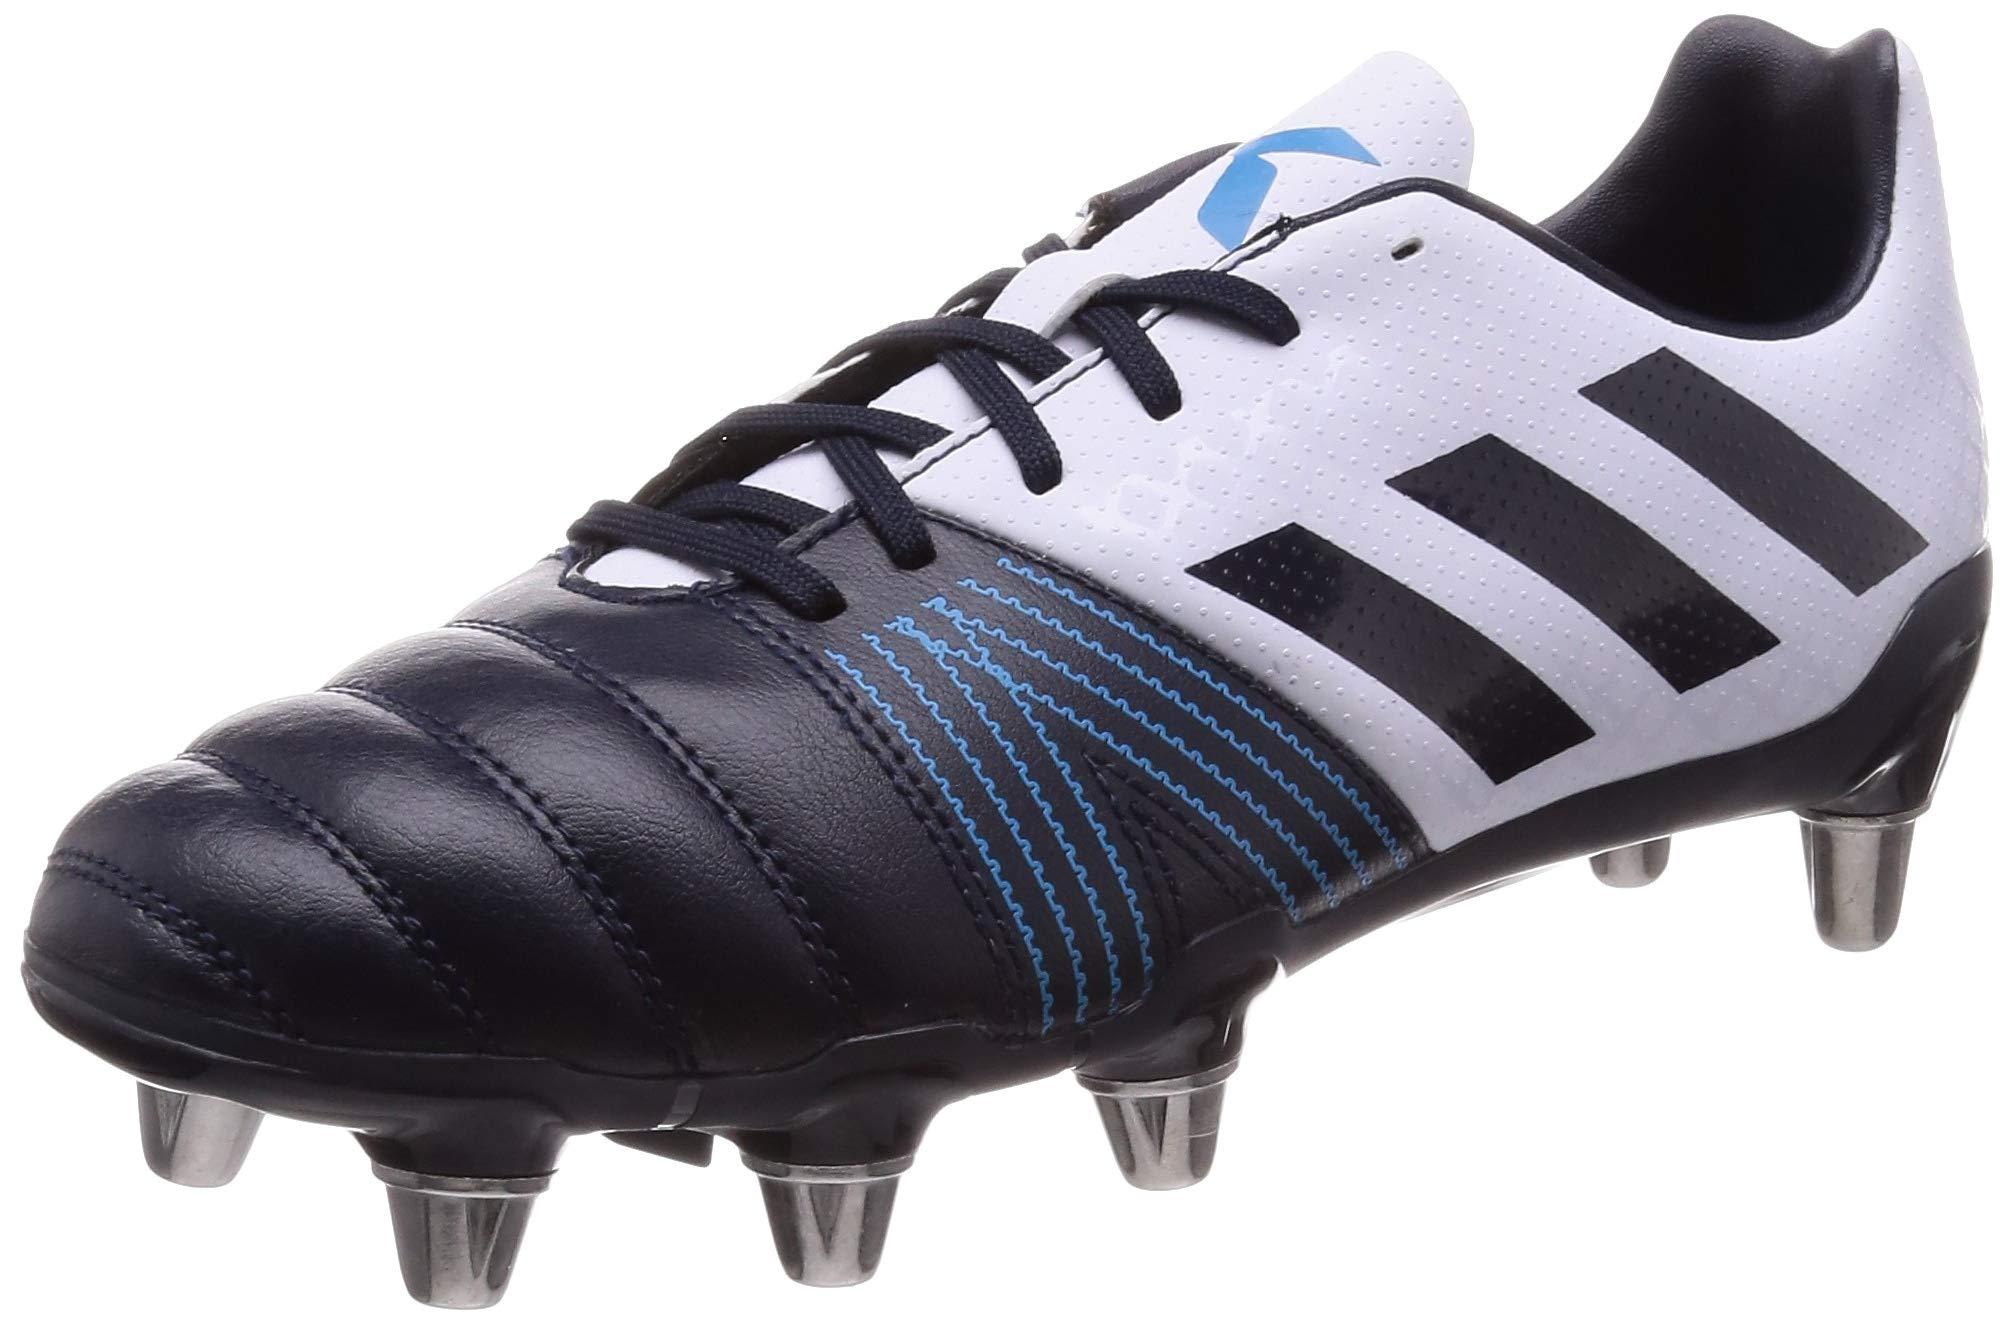 adidas Kakari SG Rugby Boots, Navy, US 11.5 by adidas